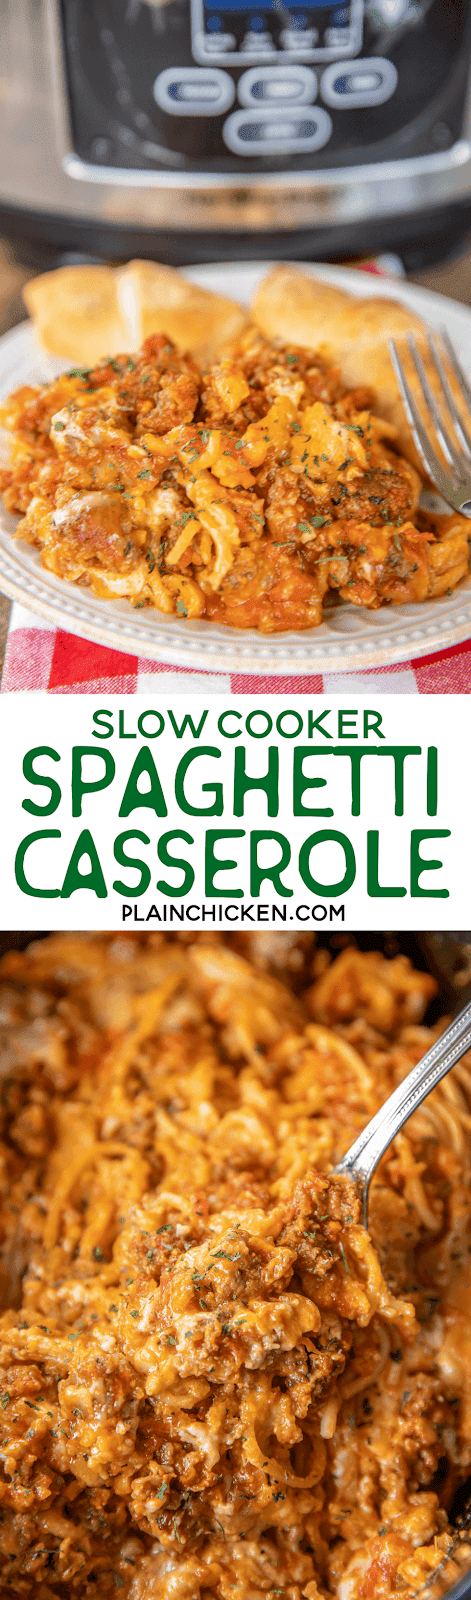 collage of 2 photos of spaghetti casserole